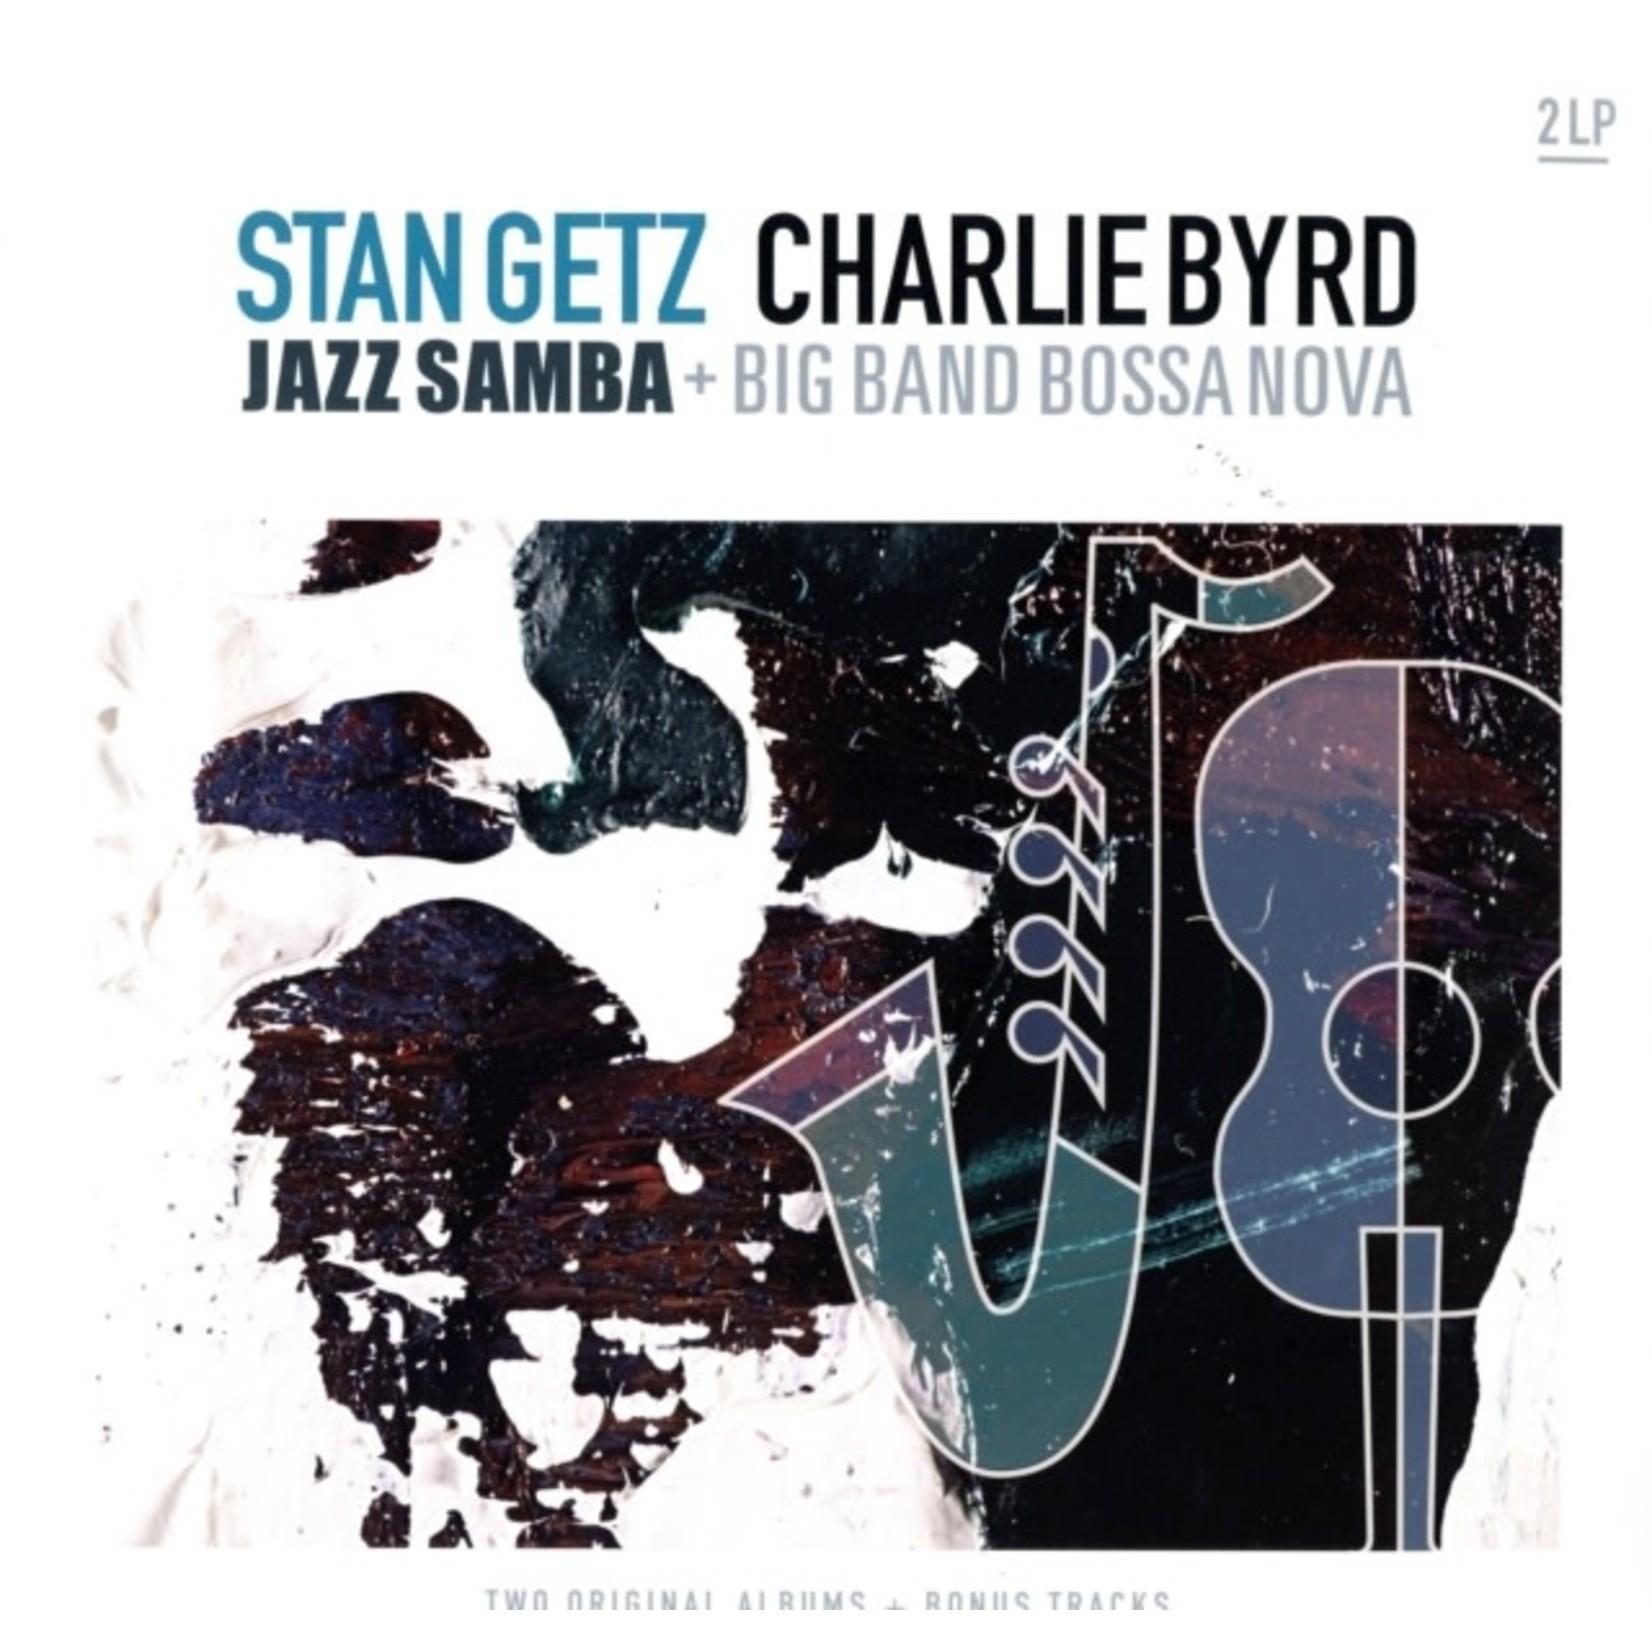 Vinyl Stan Getz/Charlie Parker - Jazz Samba + Big Band Bossa Nova  2LP